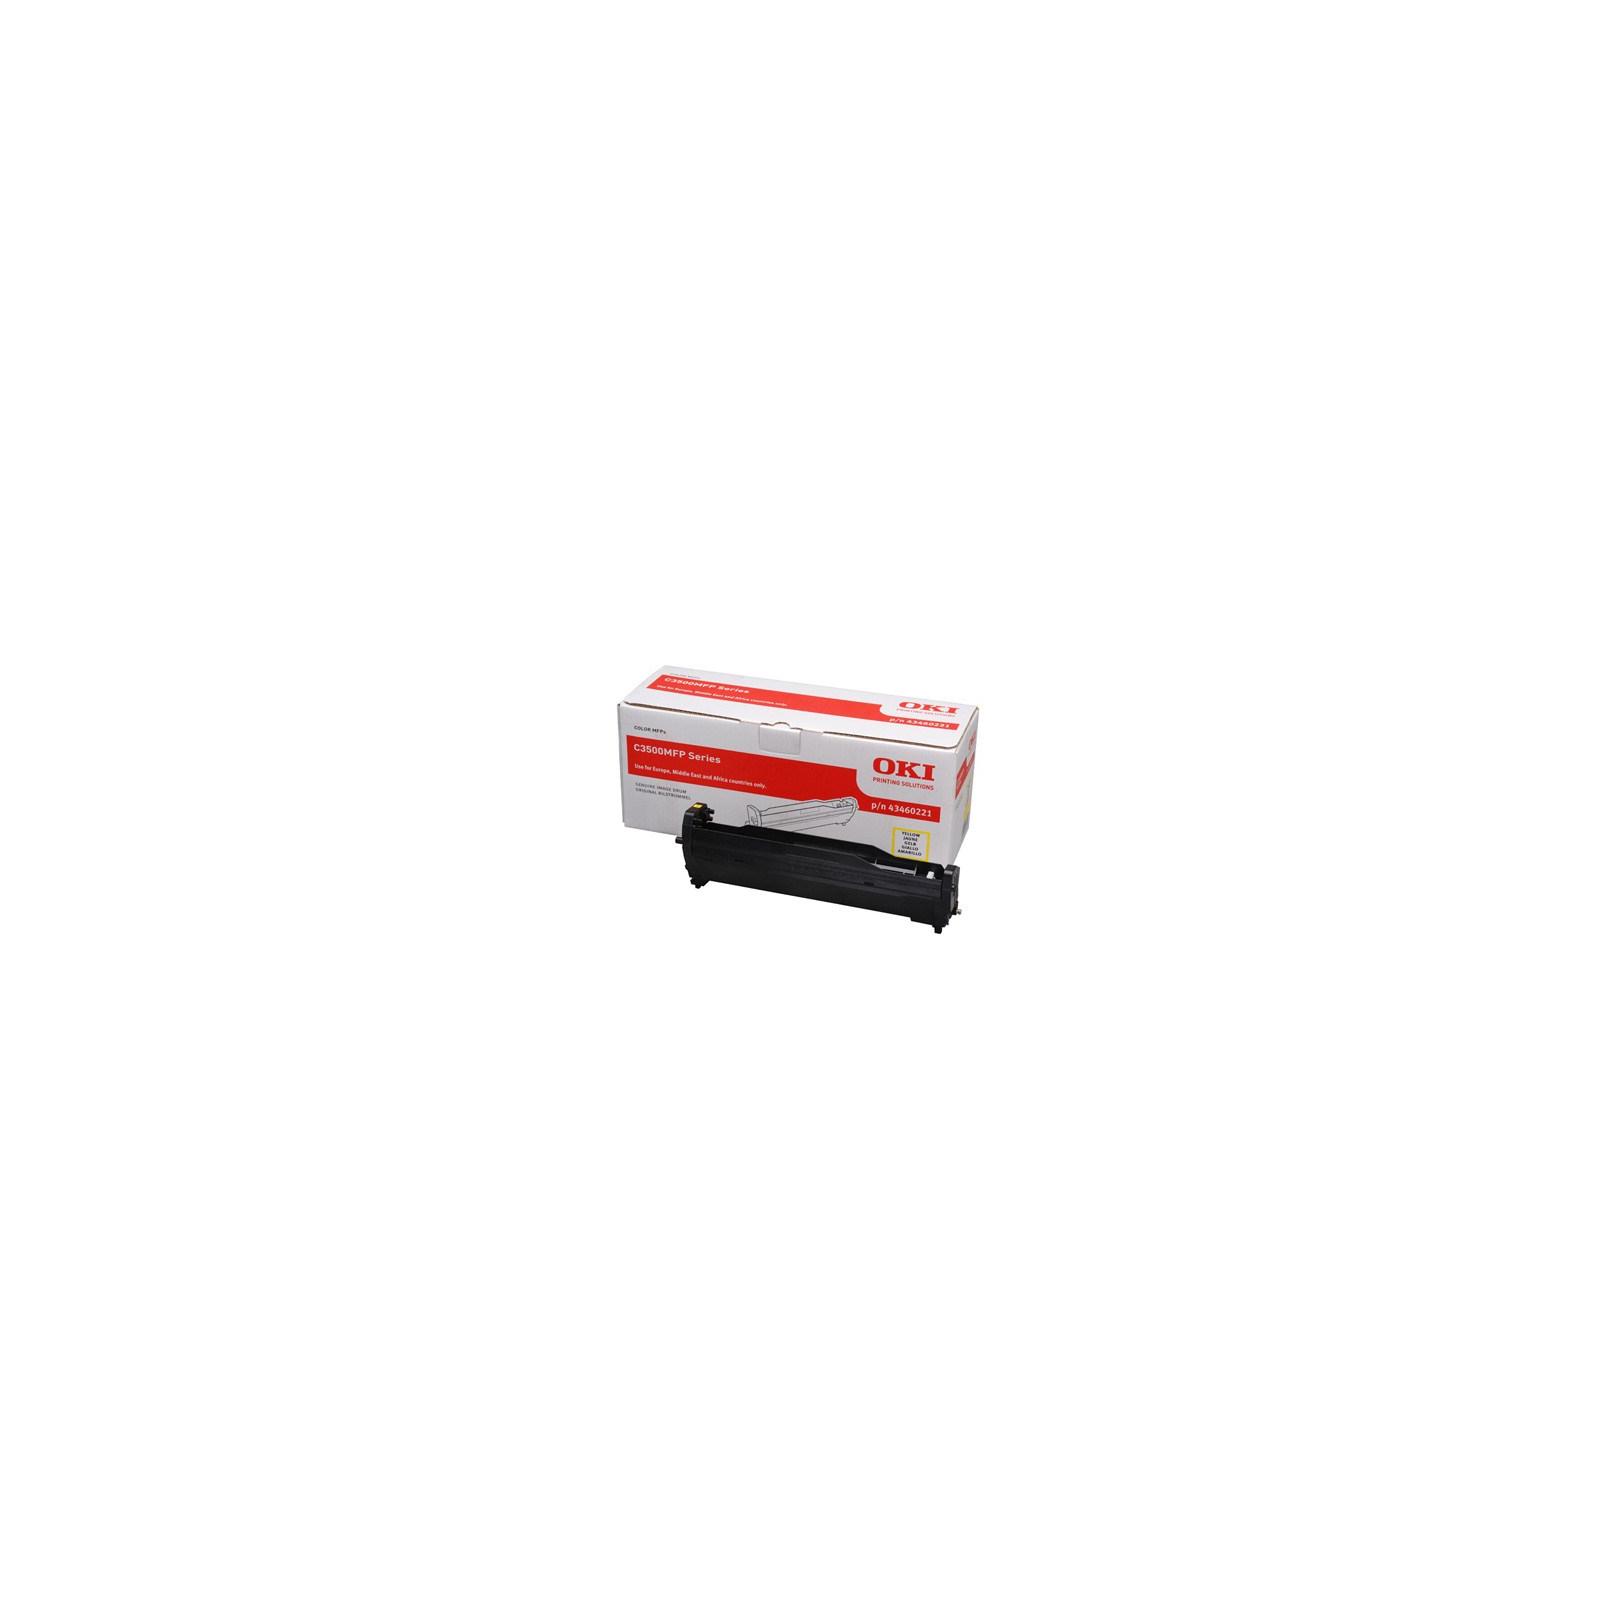 Фотокондуктор OKI C3520MFP/3530MFP/MC350/360 Yellow (43460221)